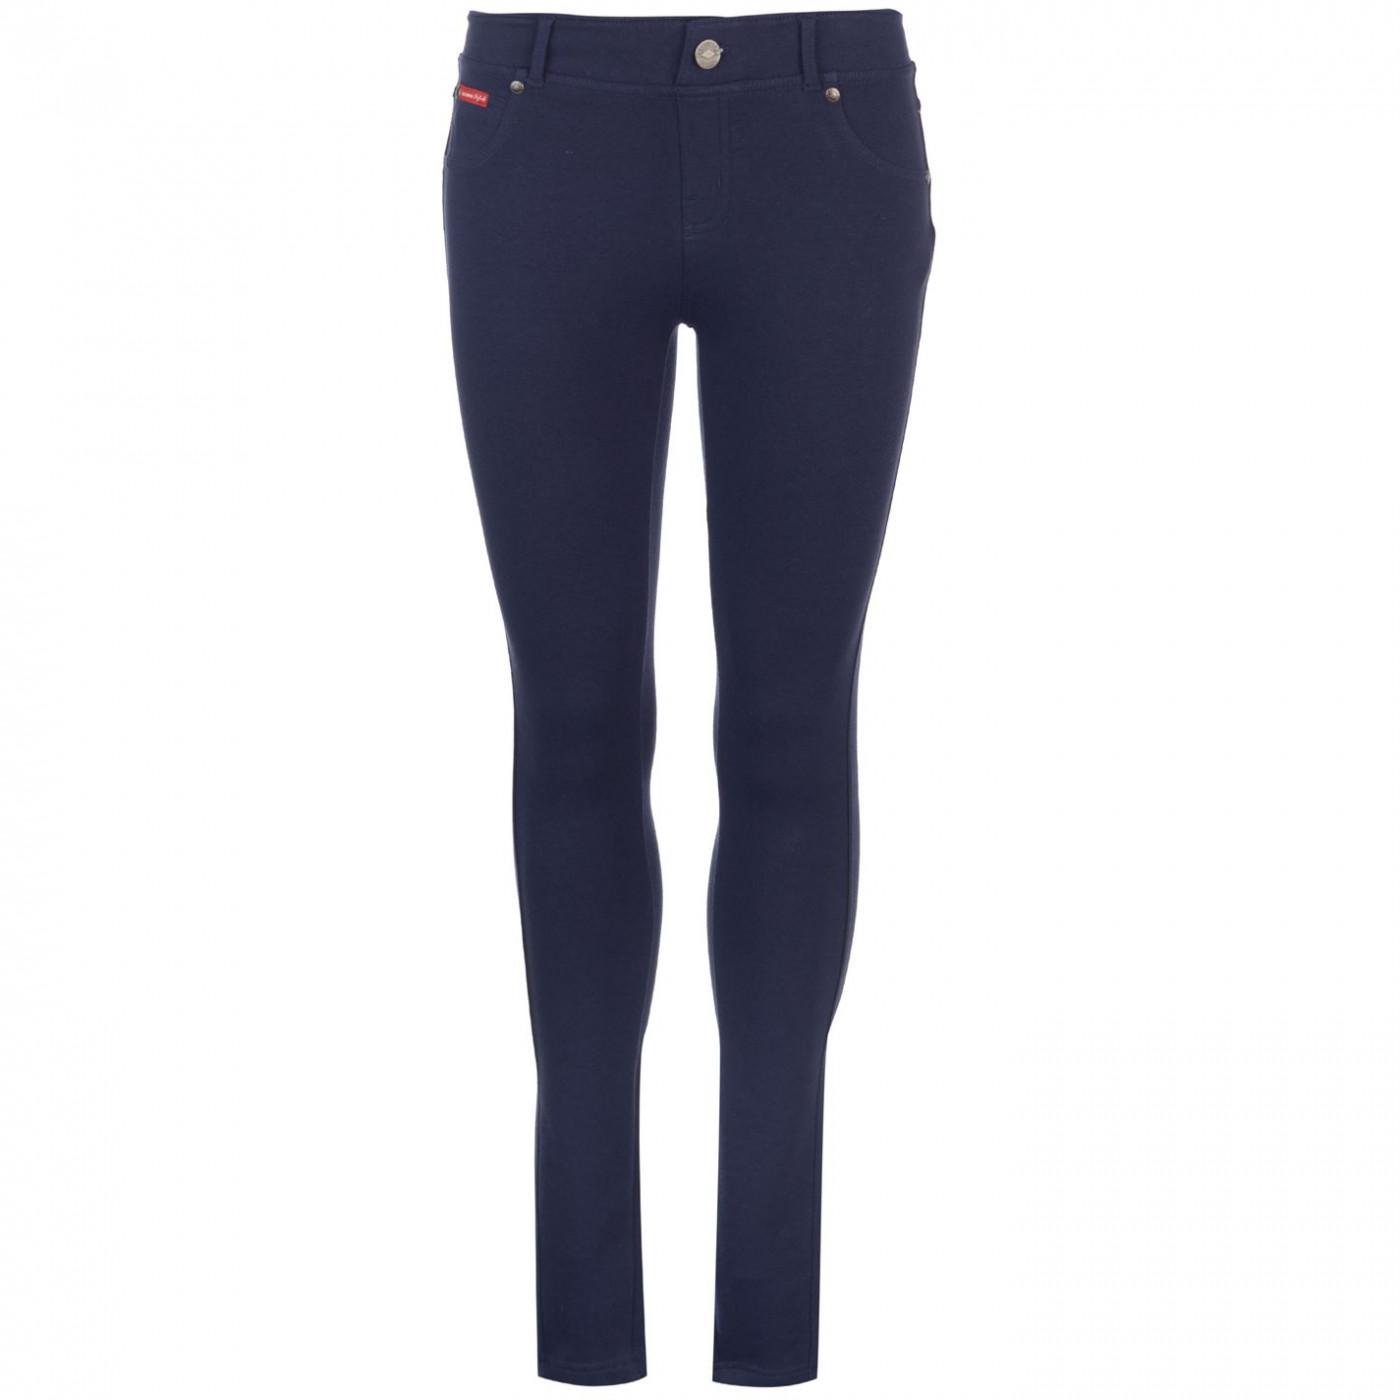 Women's jeans Lee Cooper Jeggings